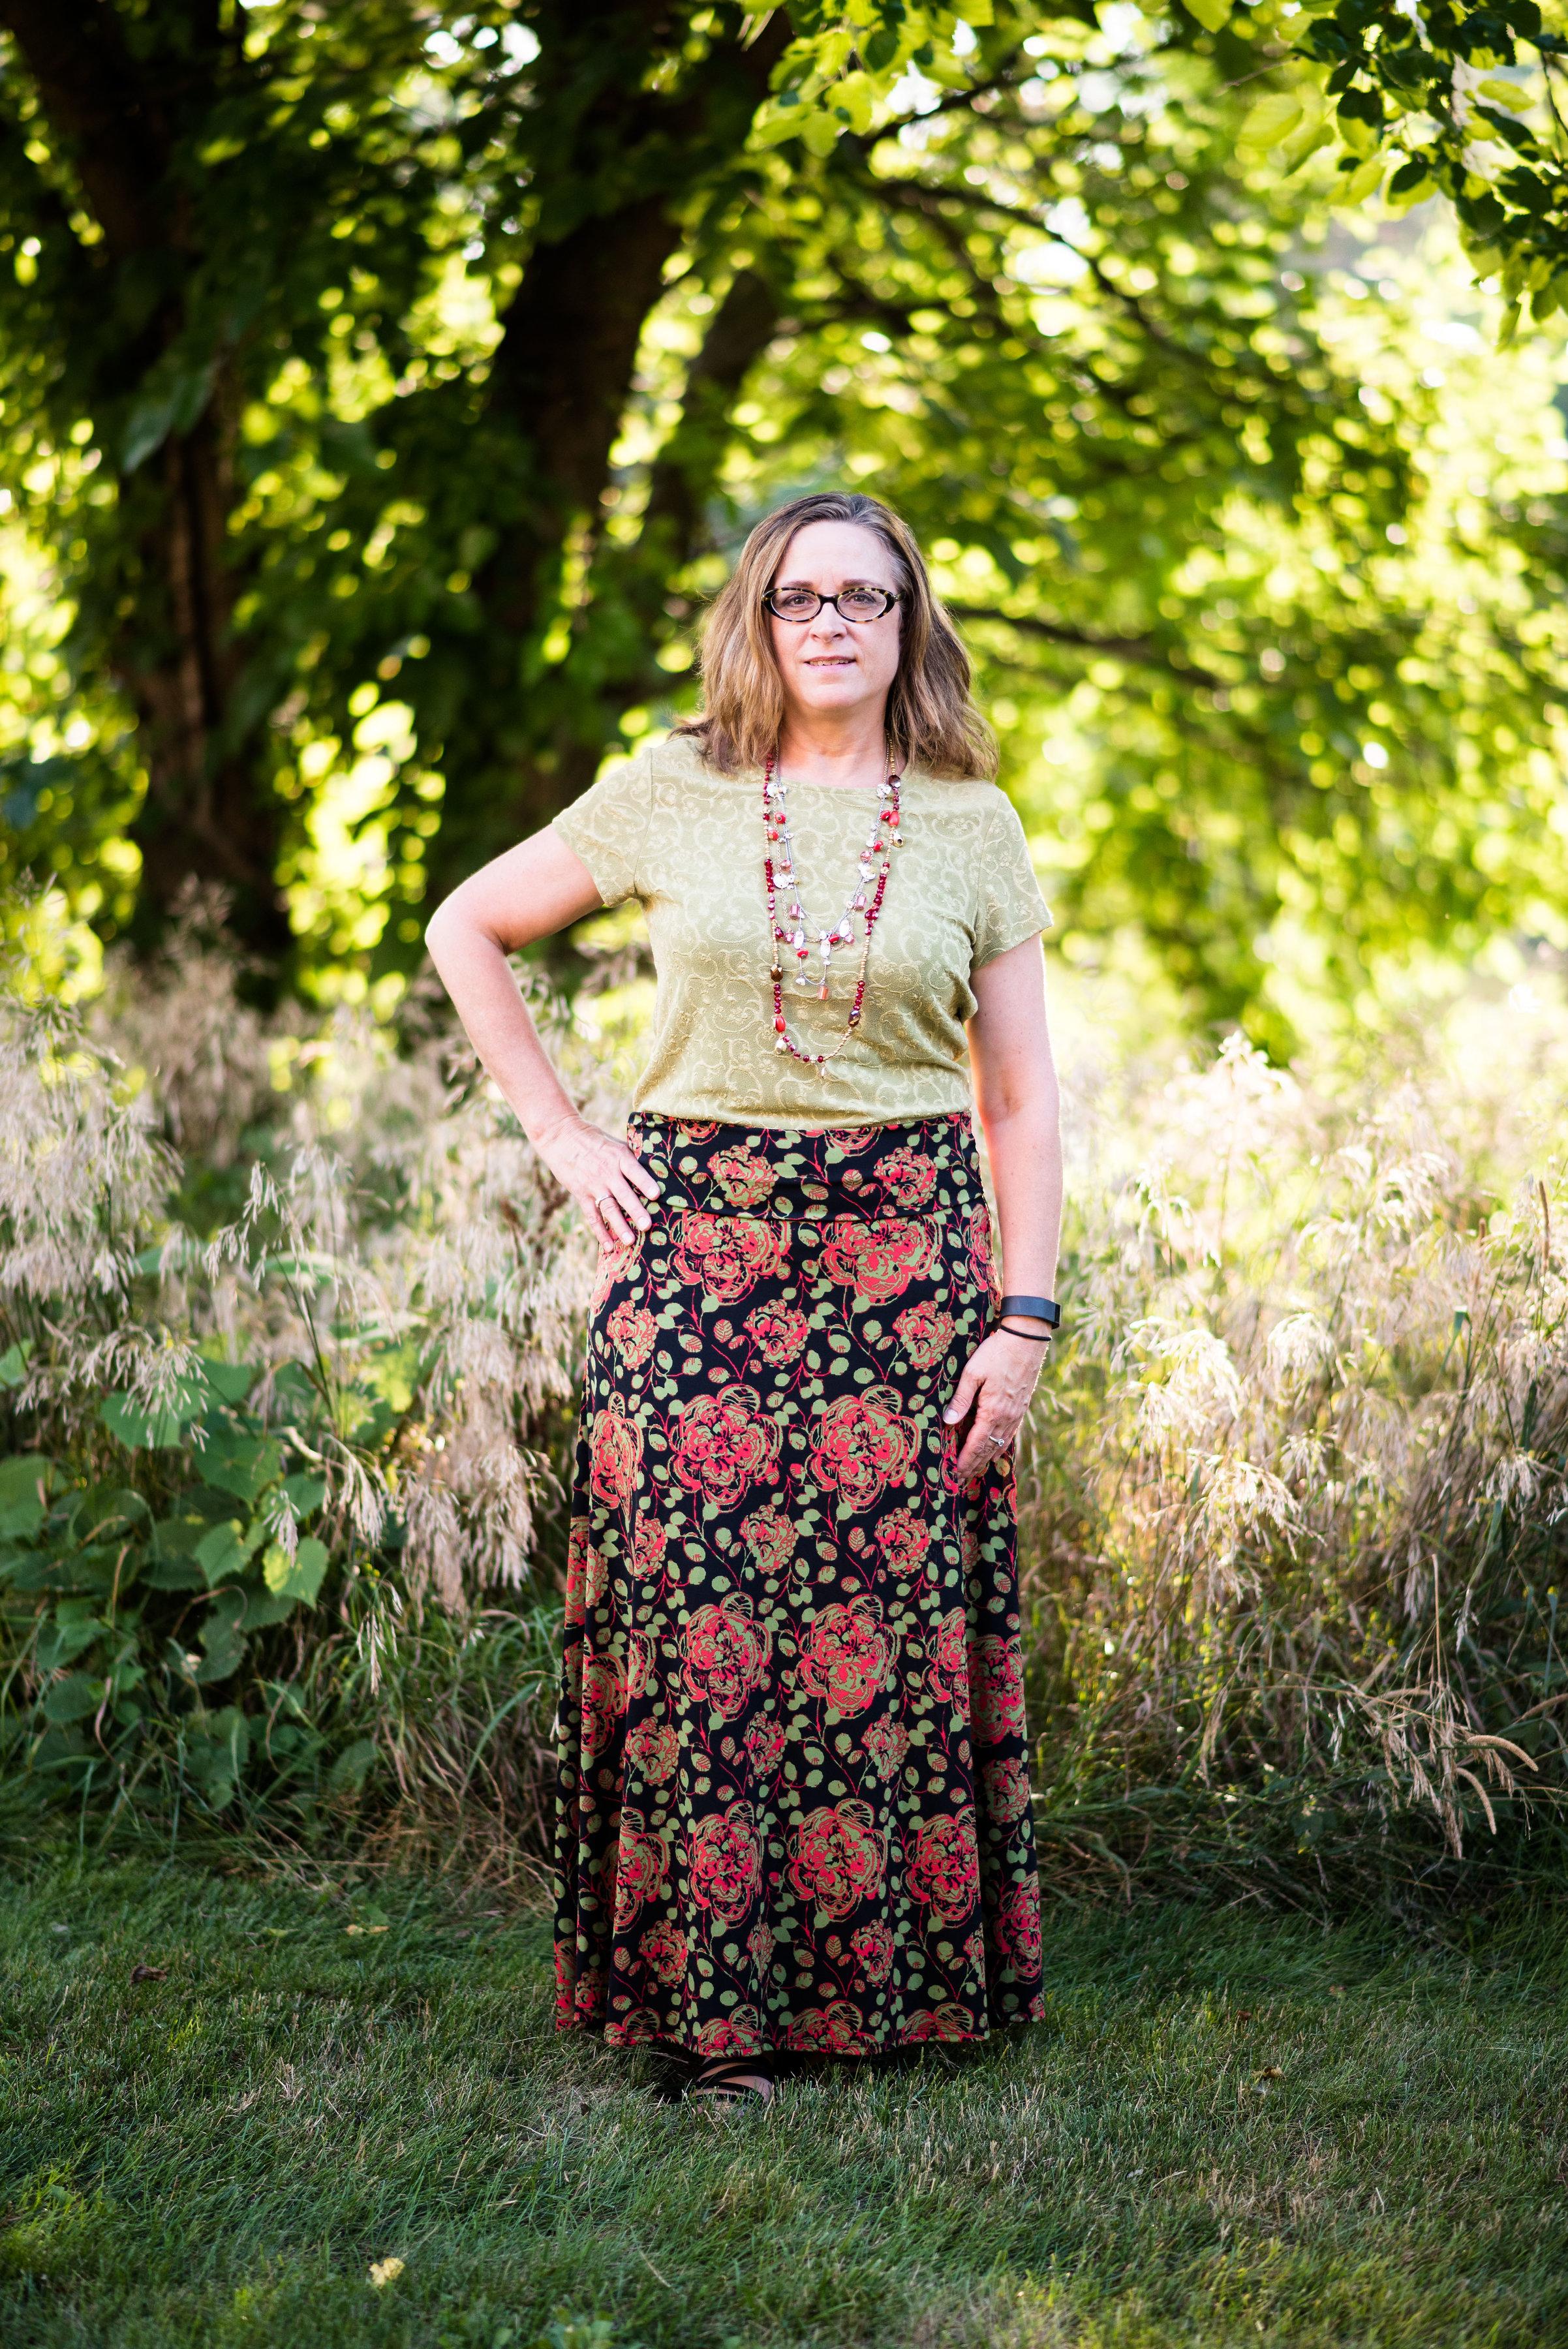 Small Business Spotlight - Kaylee Barfell and LuLaRoe